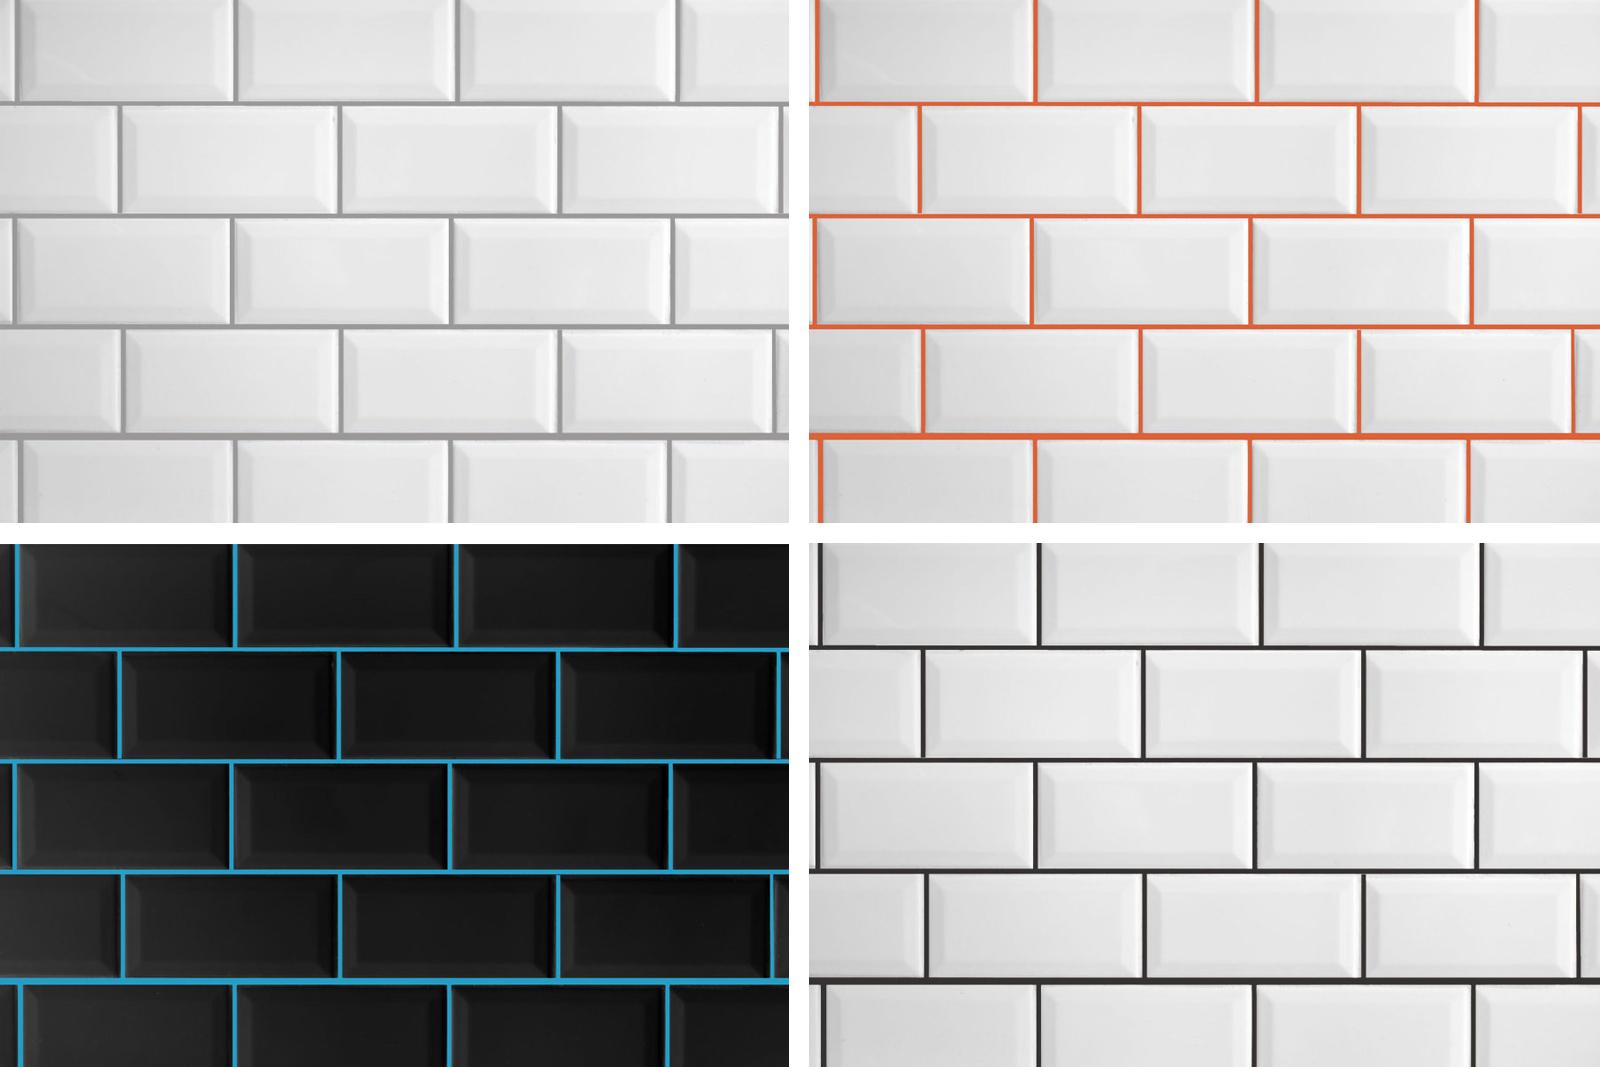 Can I use bathroom tiles for maximum impact?